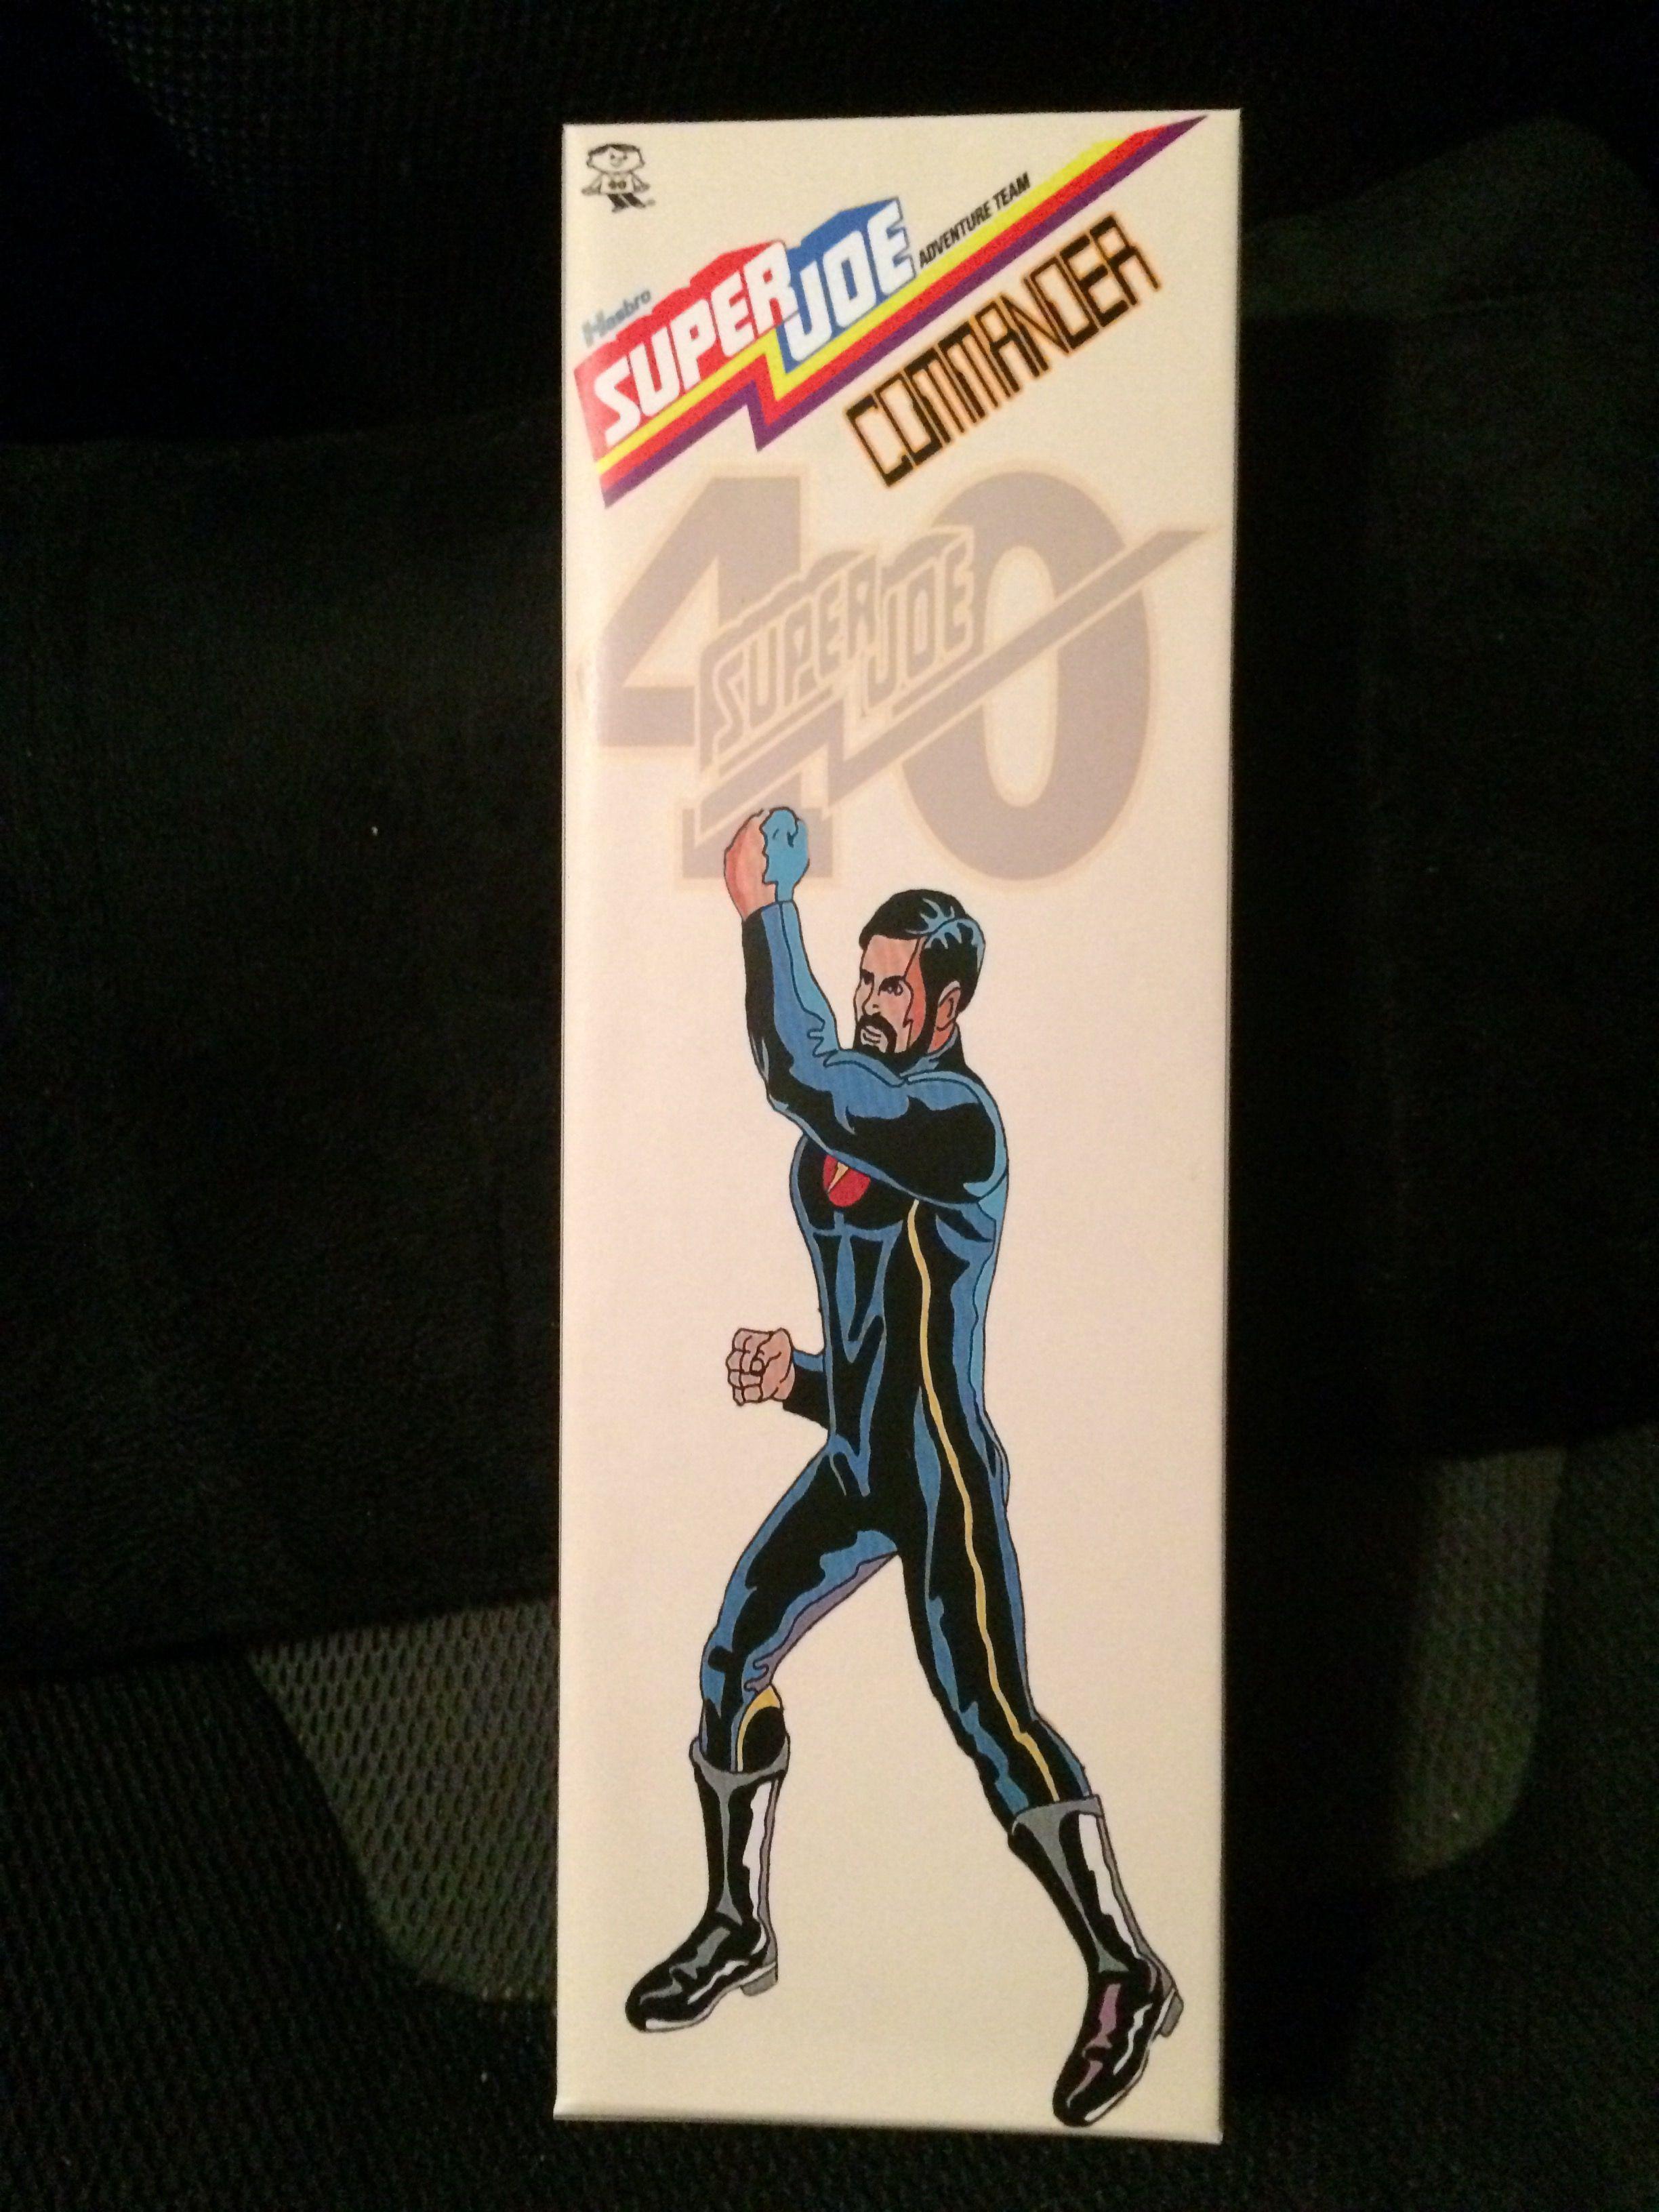 Custom 12 inch 40th Anniversary Super Joe Commander  Coffin Box $15.00 + Shipping